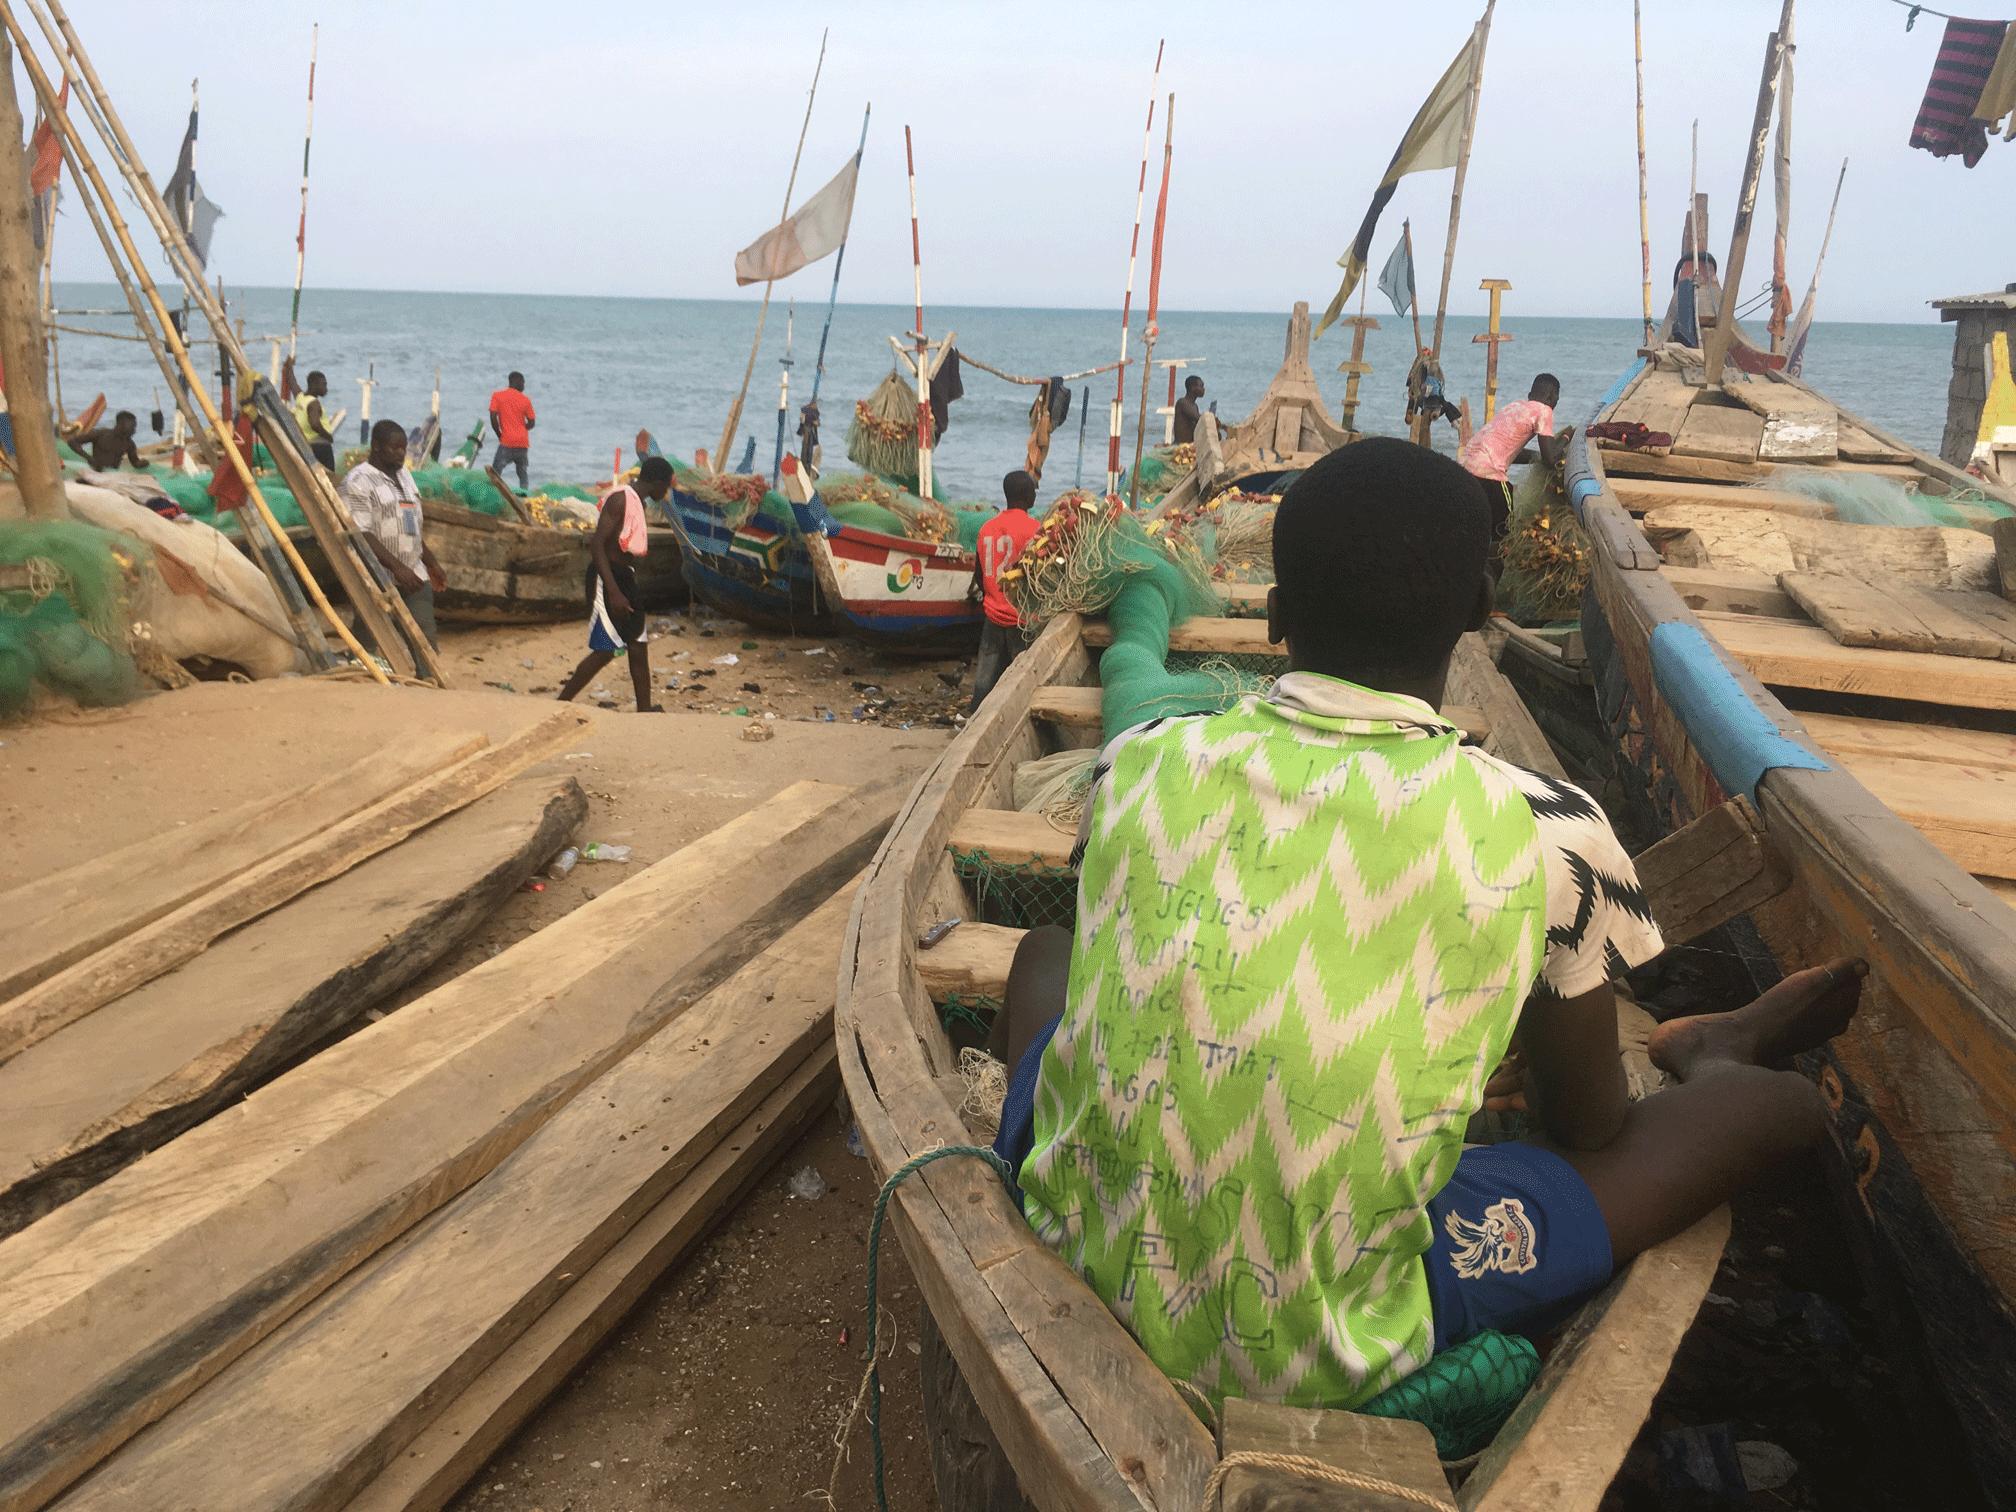 A fisherman in Anaafo, Ghana.